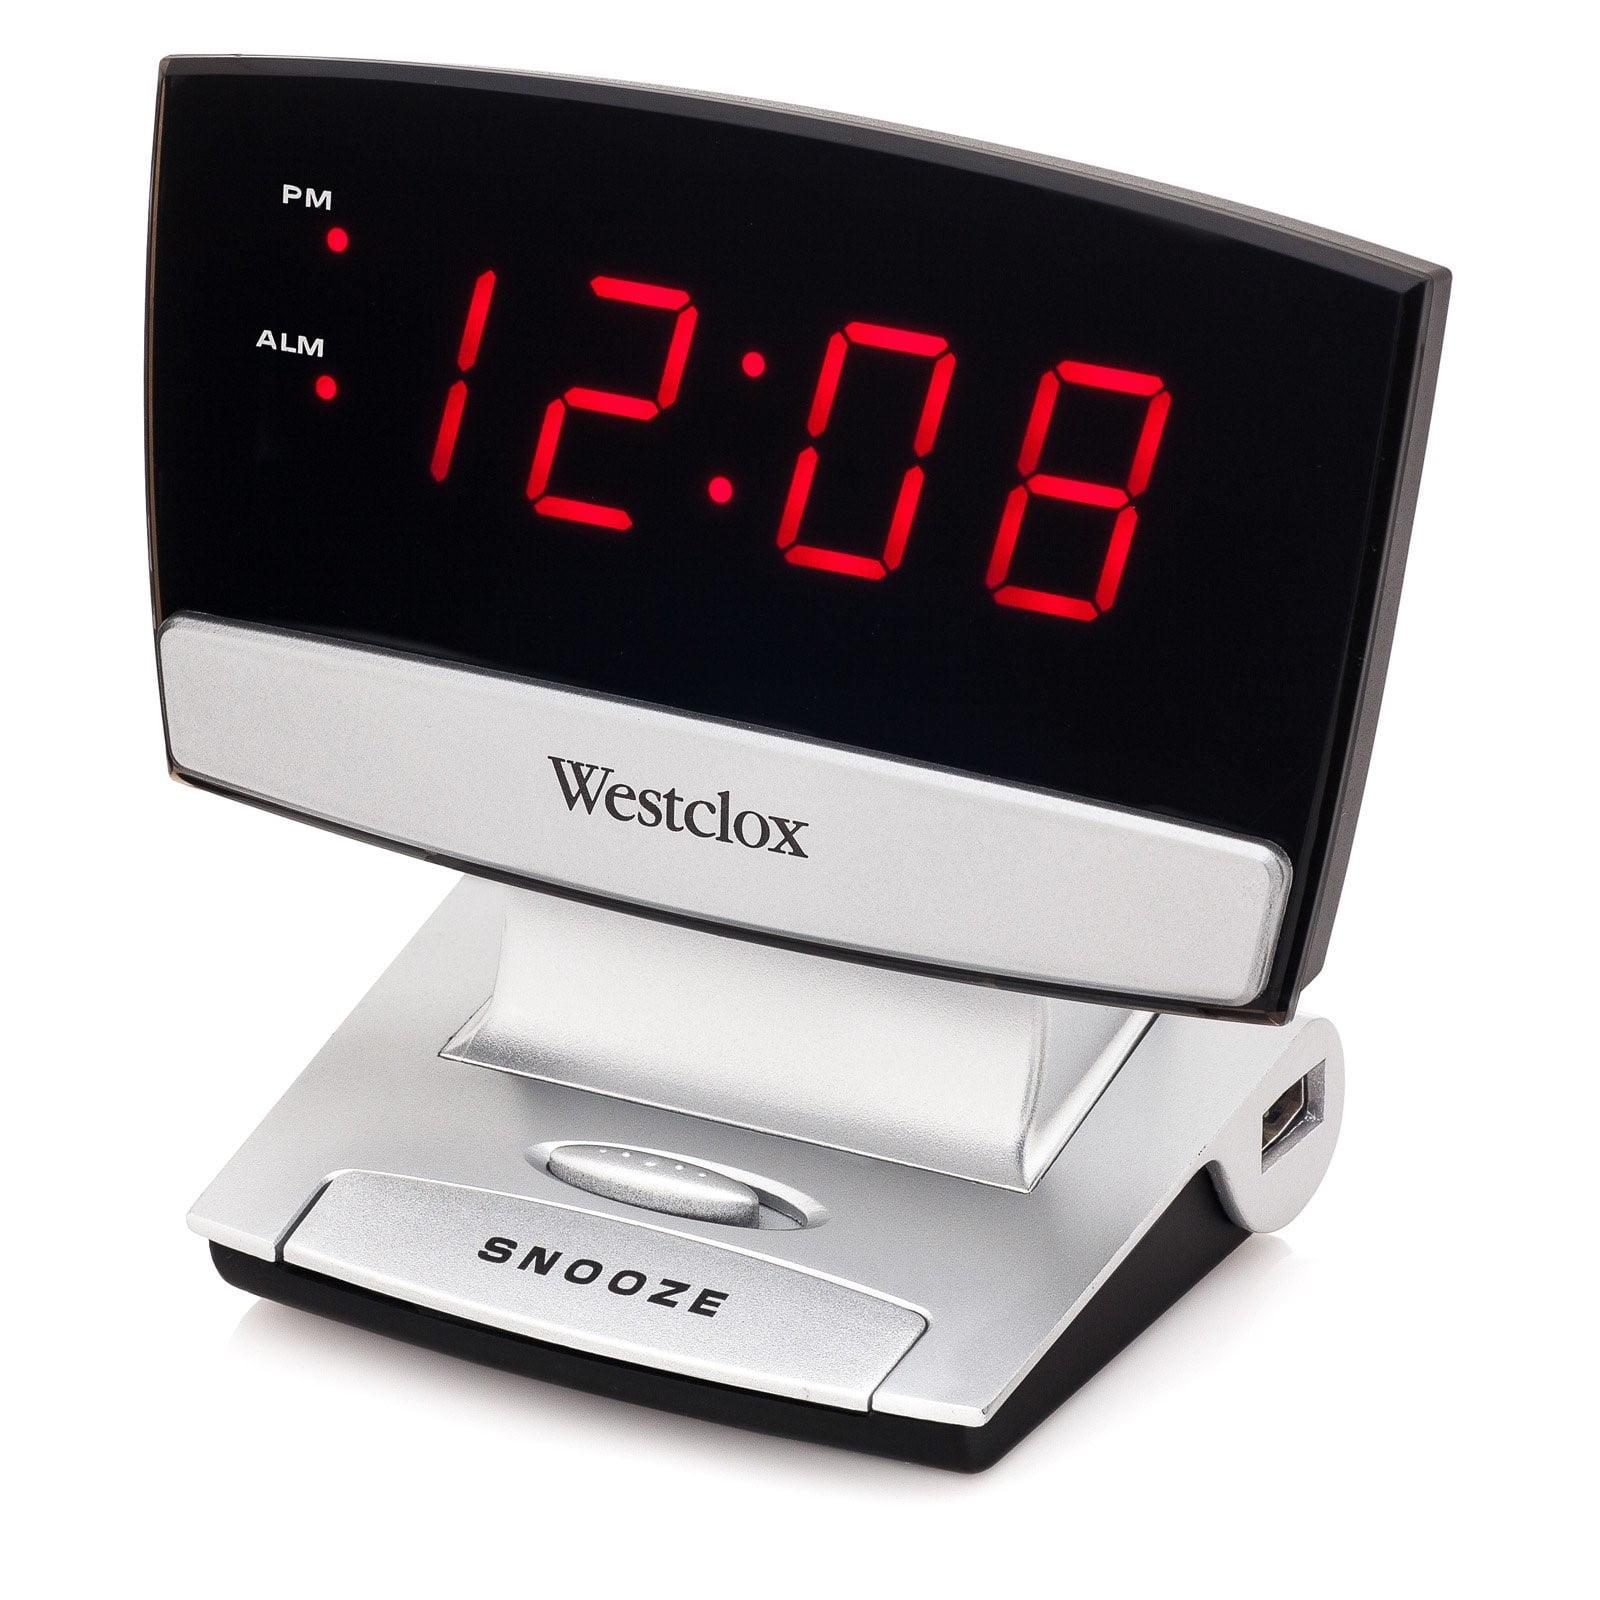 Westclox LED Display Alarm Clock with USB Charging Port- Style# 71014X